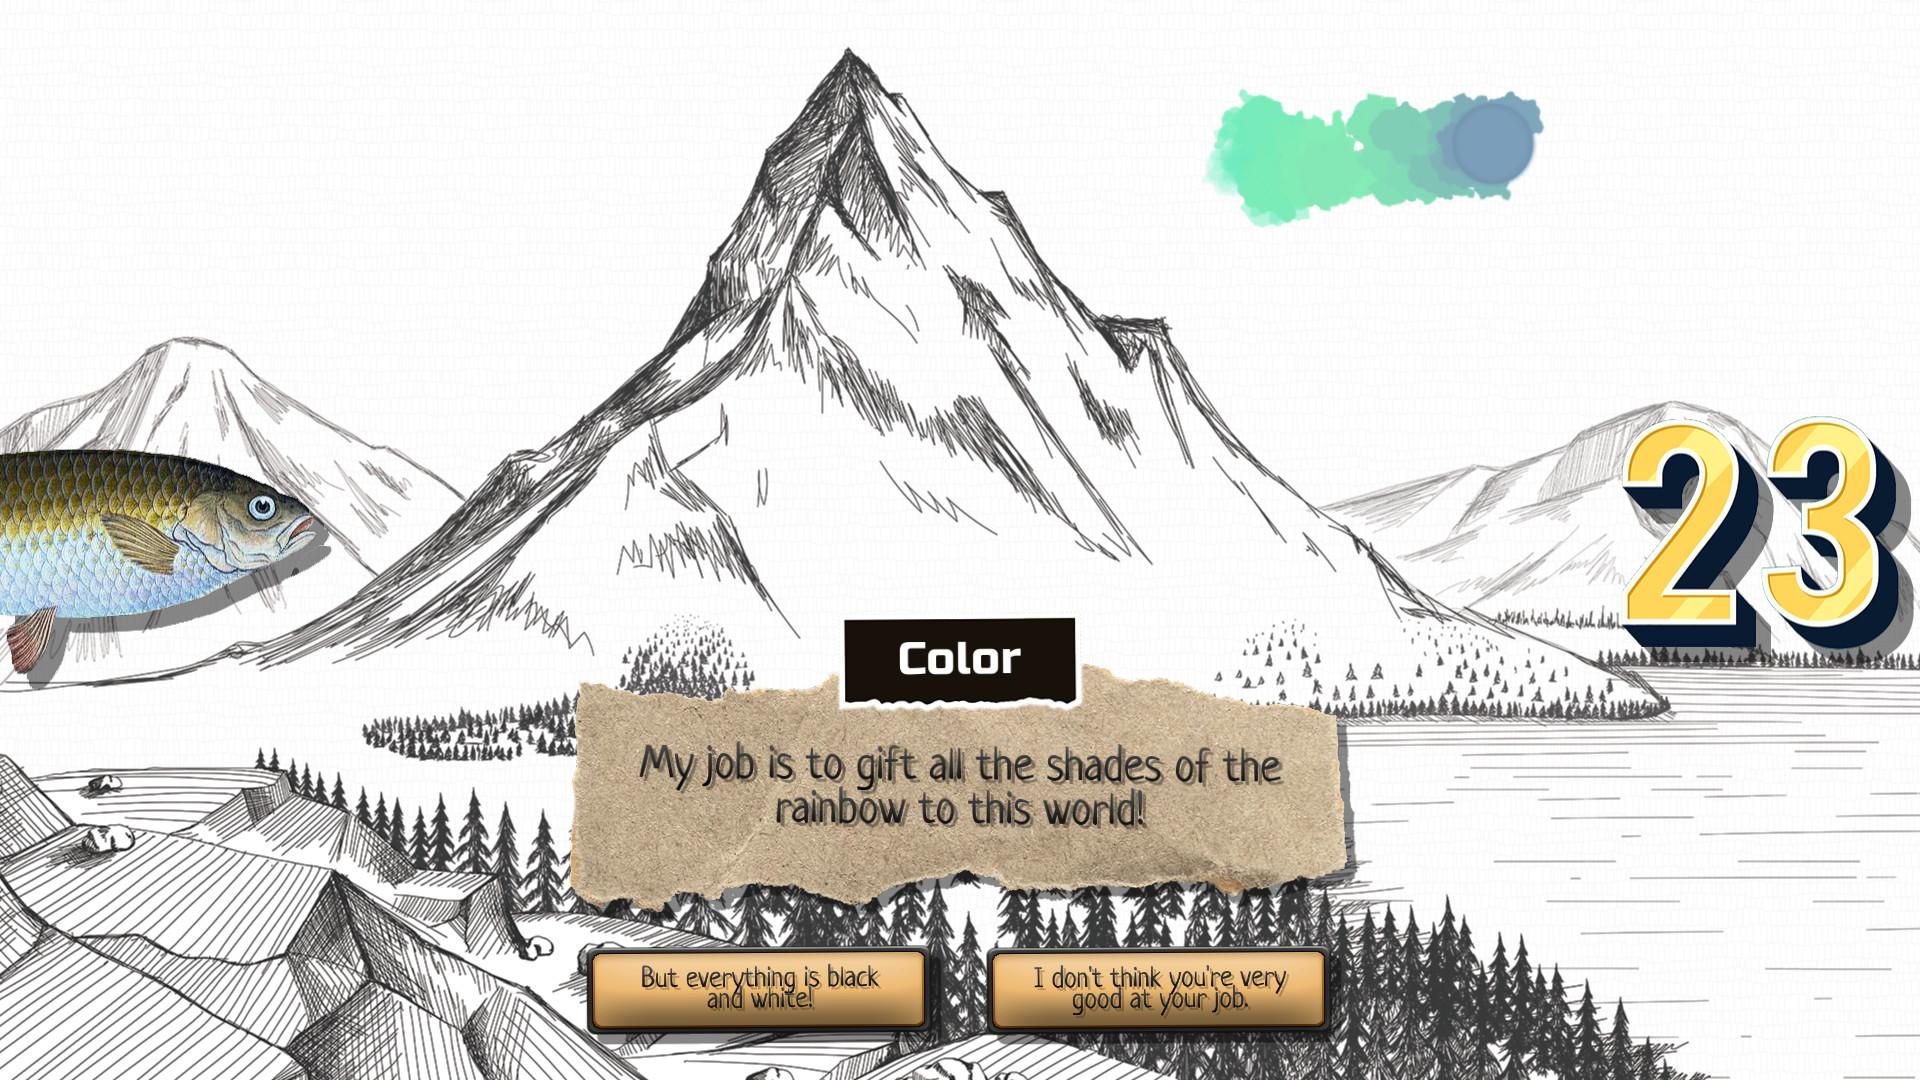 Odd Adventure of Chub, Color, 23 and You screenshot